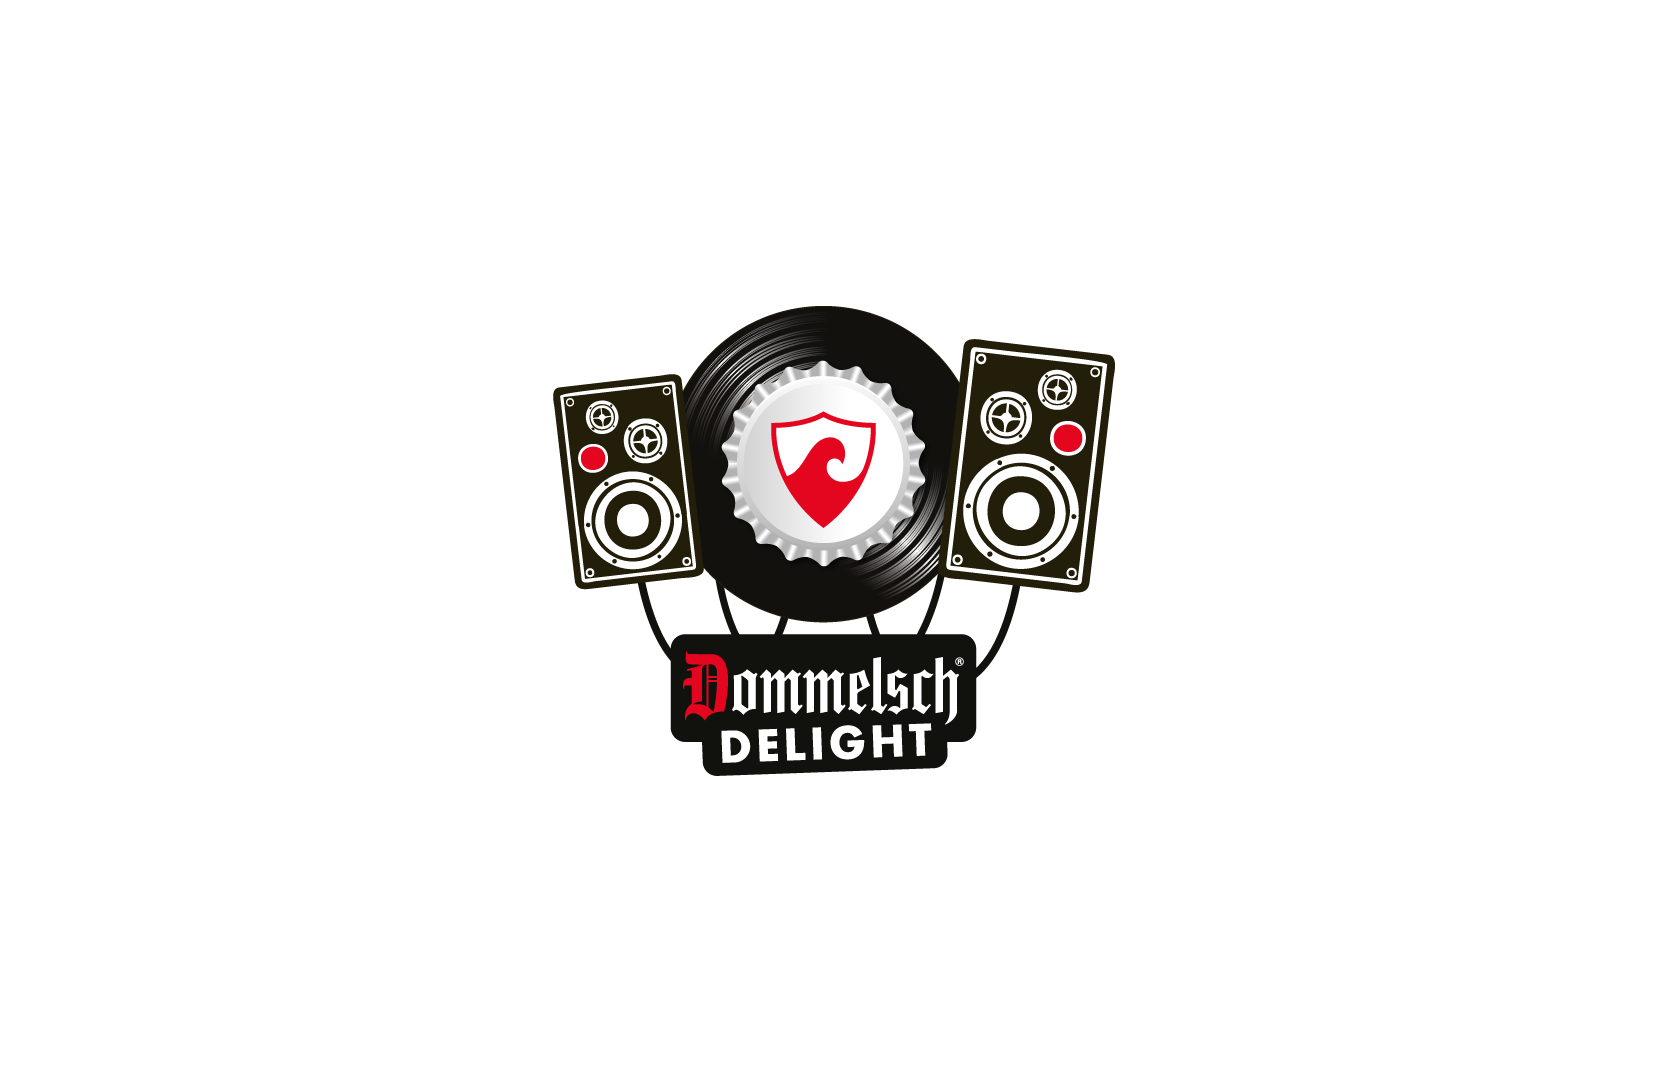 multi_dommelsch_logo2